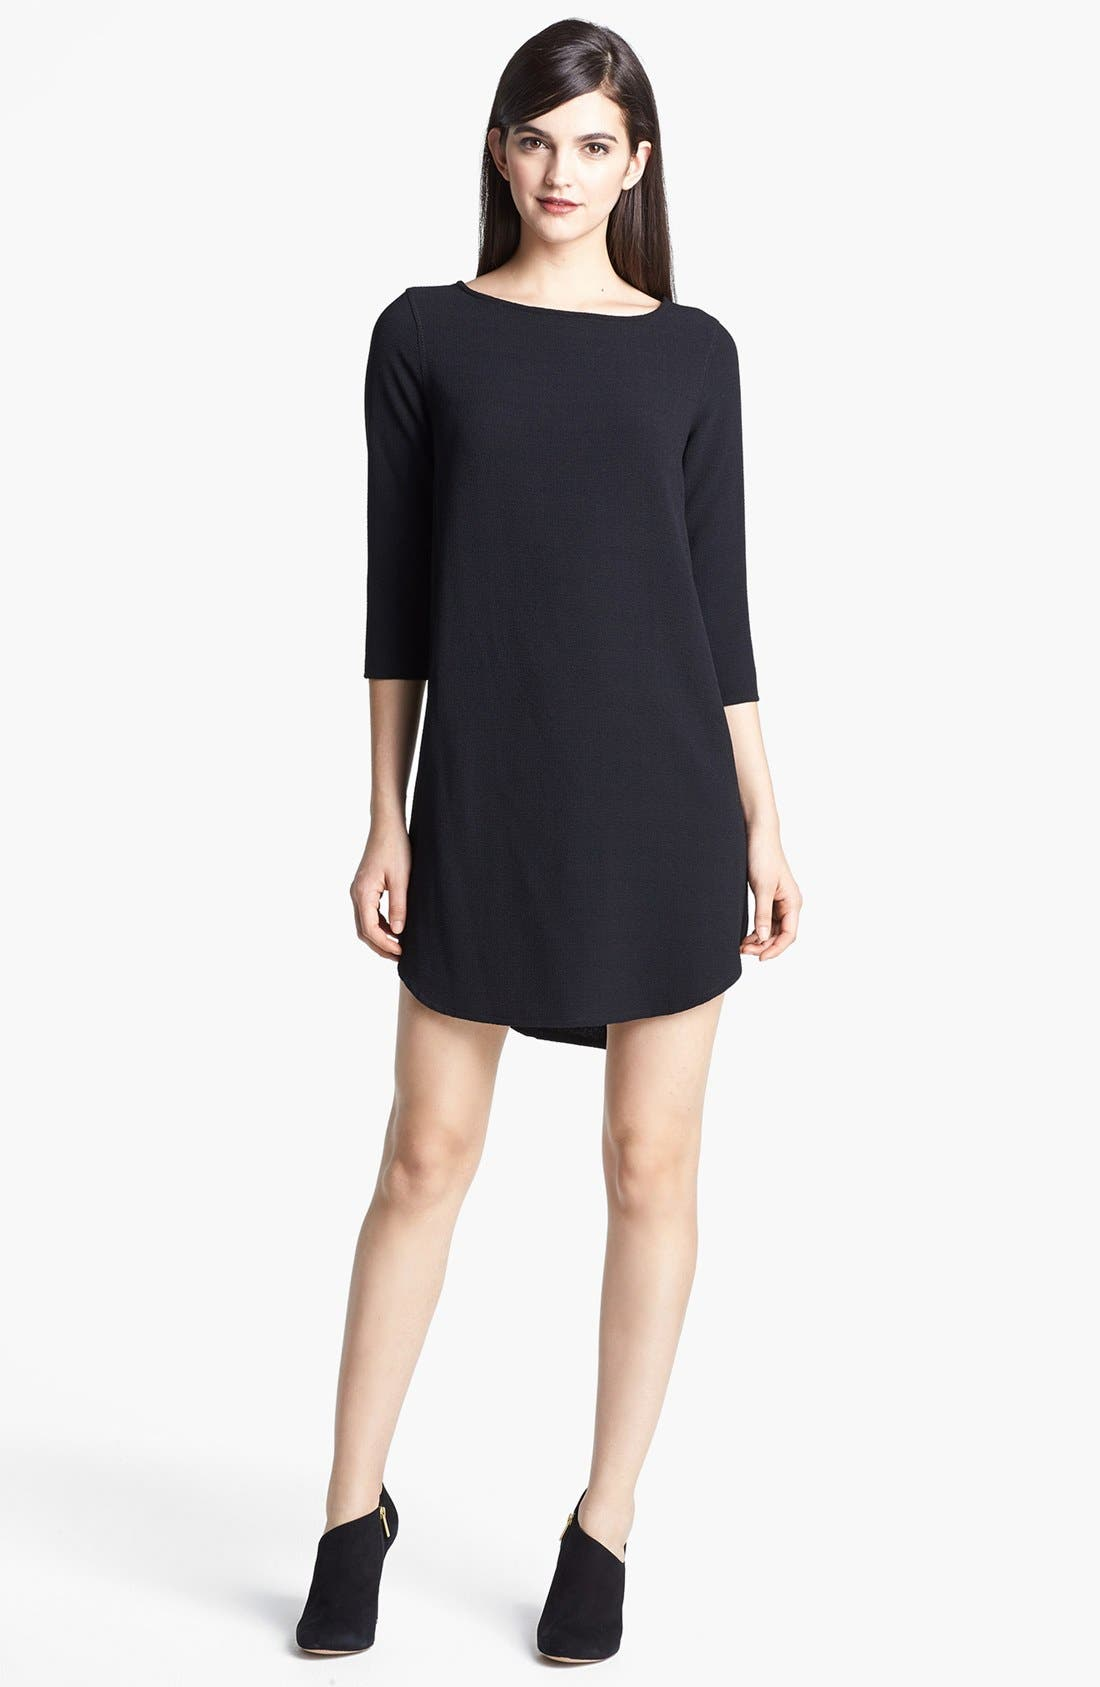 Alternate Image 1 Selected - BB Dakota 'Noland' Textured Crepe Dress